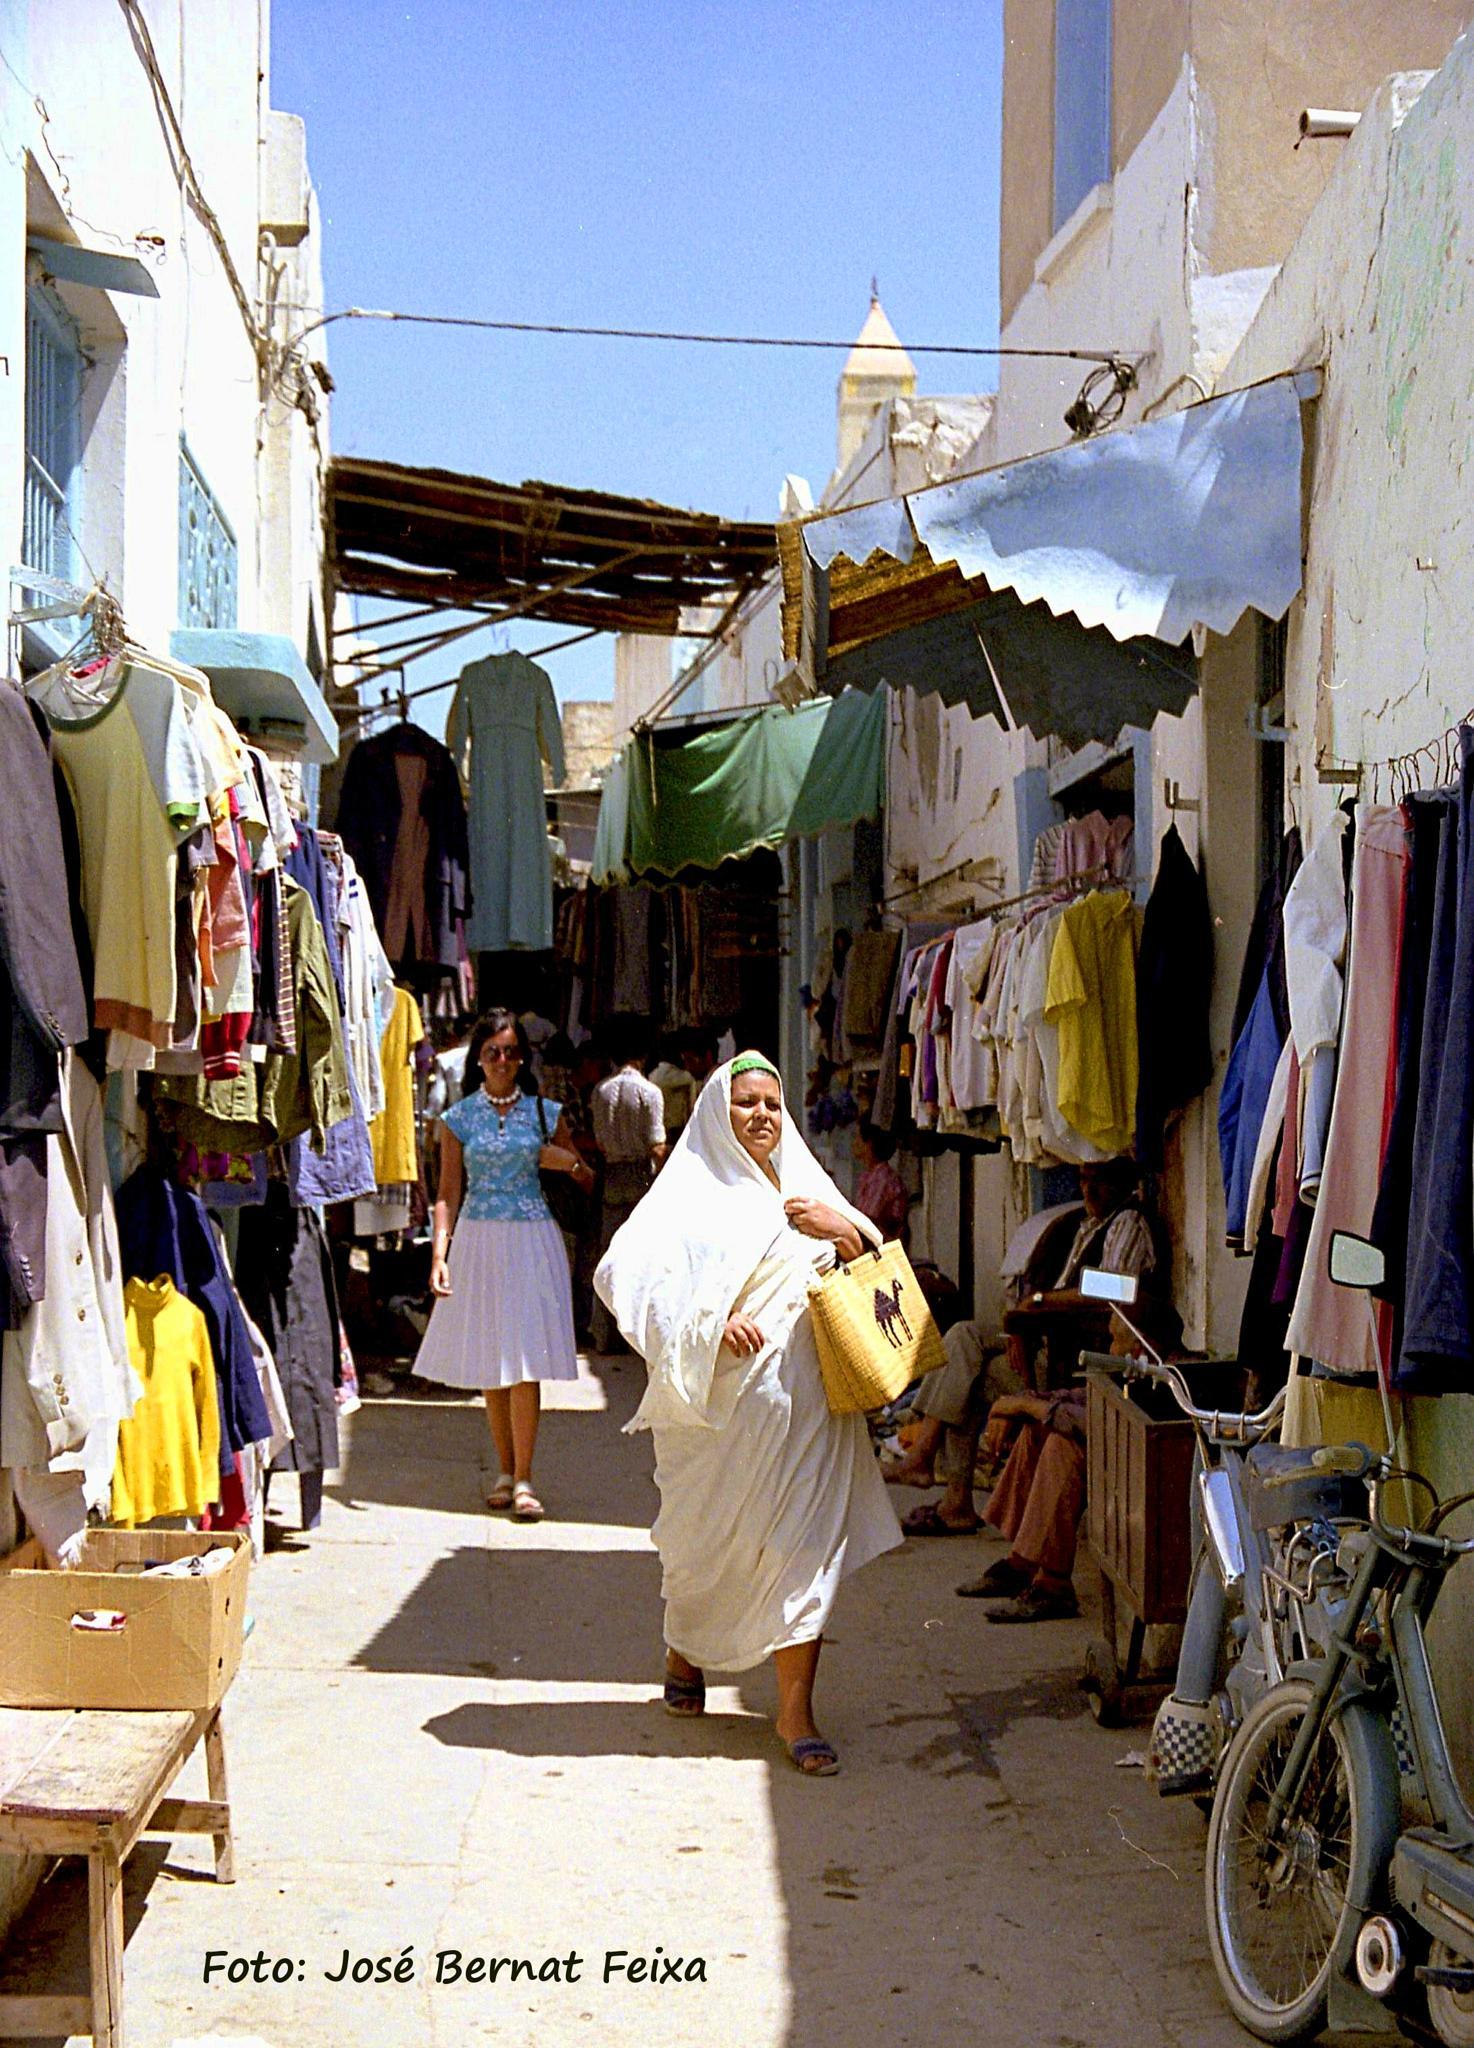 CALLE, STRAAT, STREET, Sousse, Tunesië (1978) by José Bernat Feixa